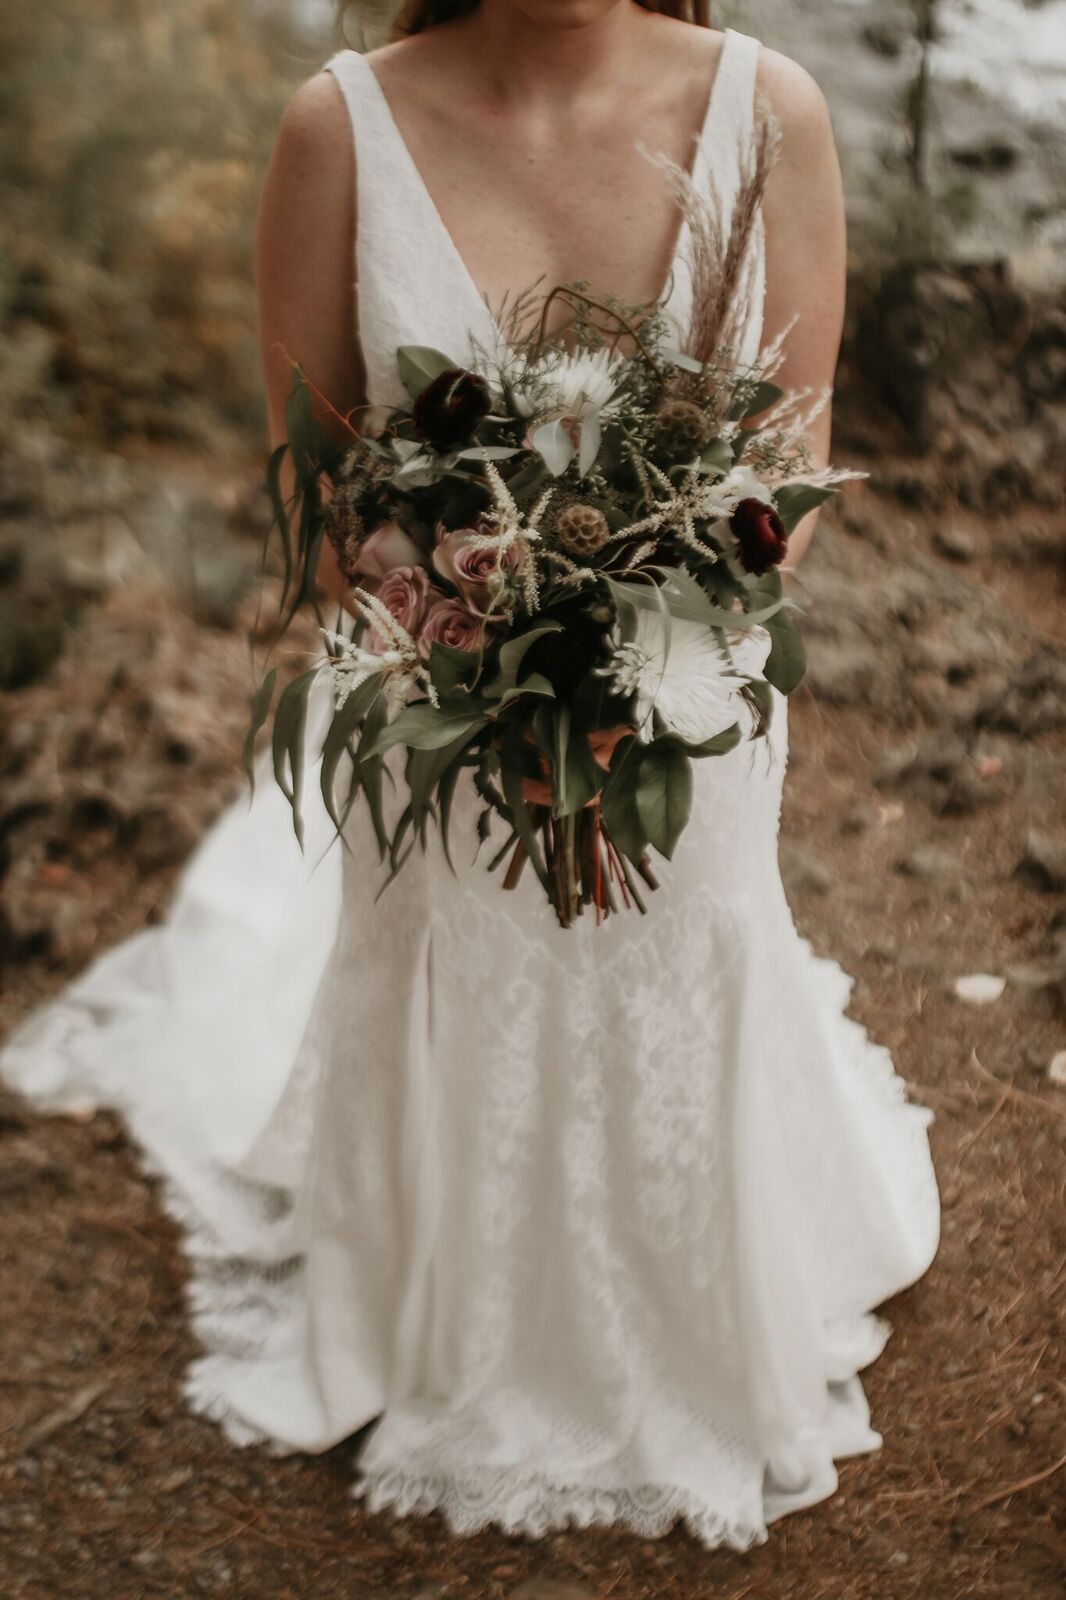 spokane river wedding photo shoot image7